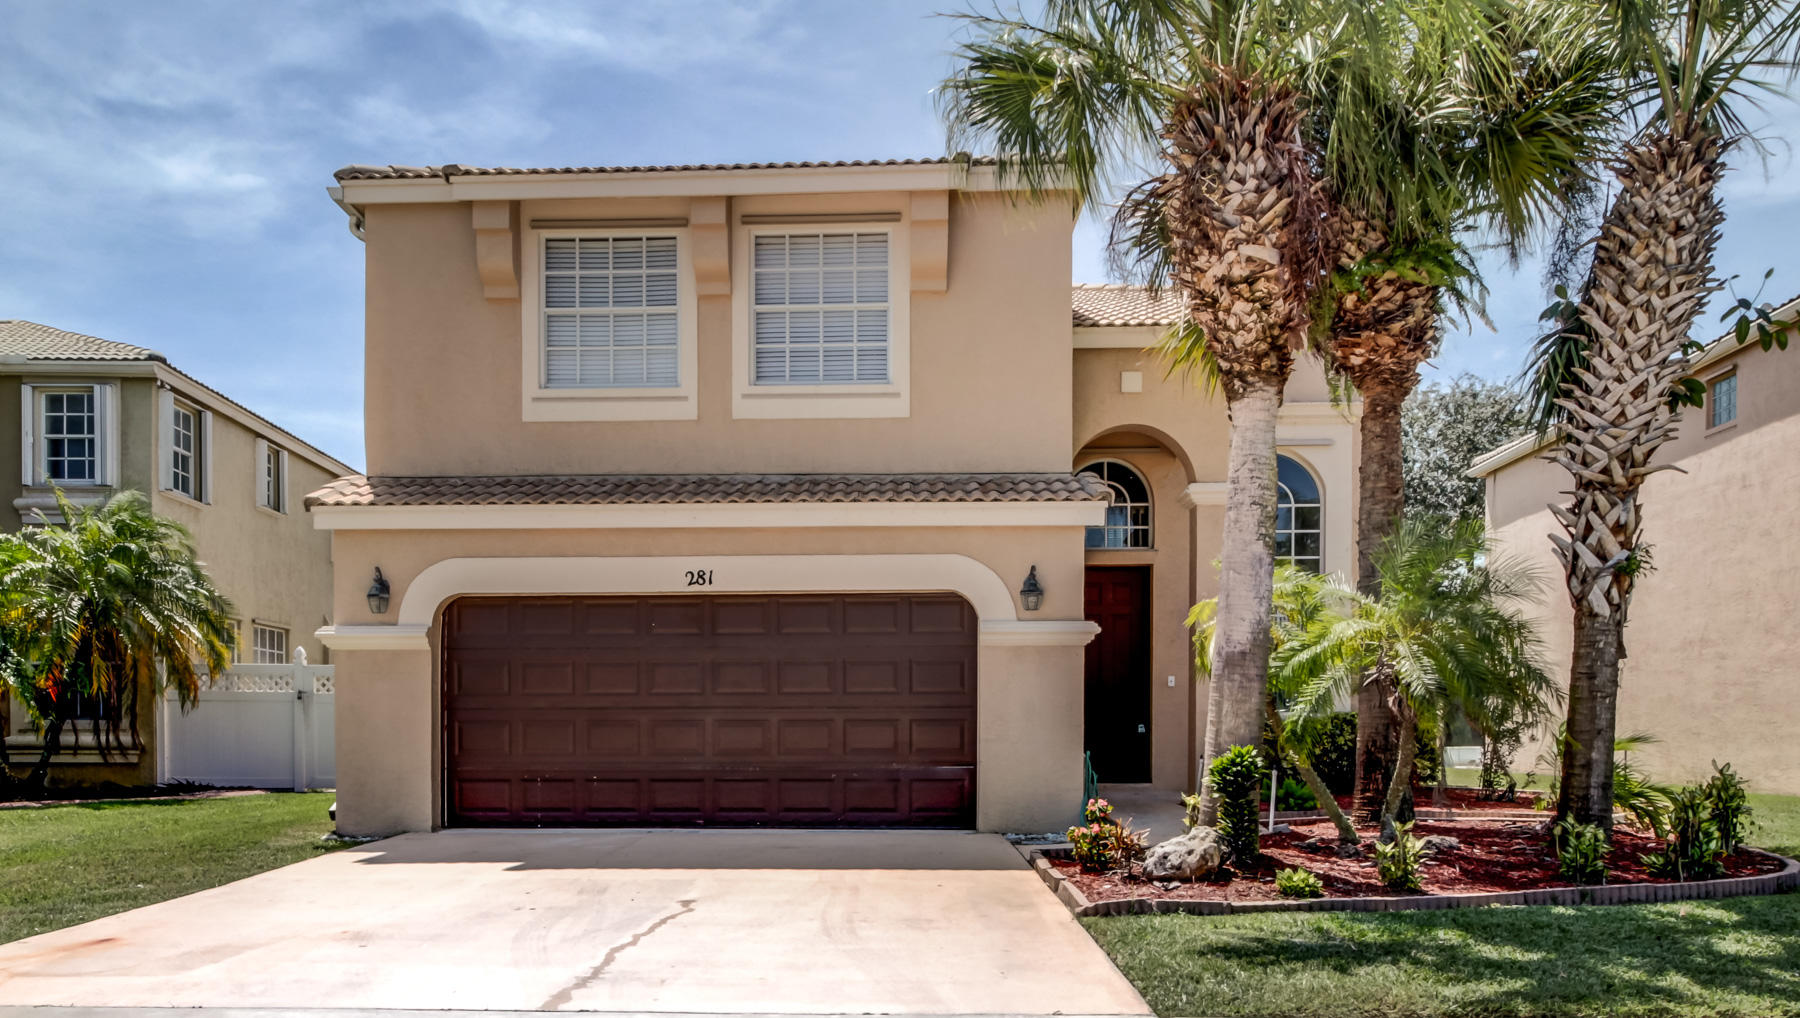 281 Saratoga E Boulevard, Royal Palm Beach, FL 33411